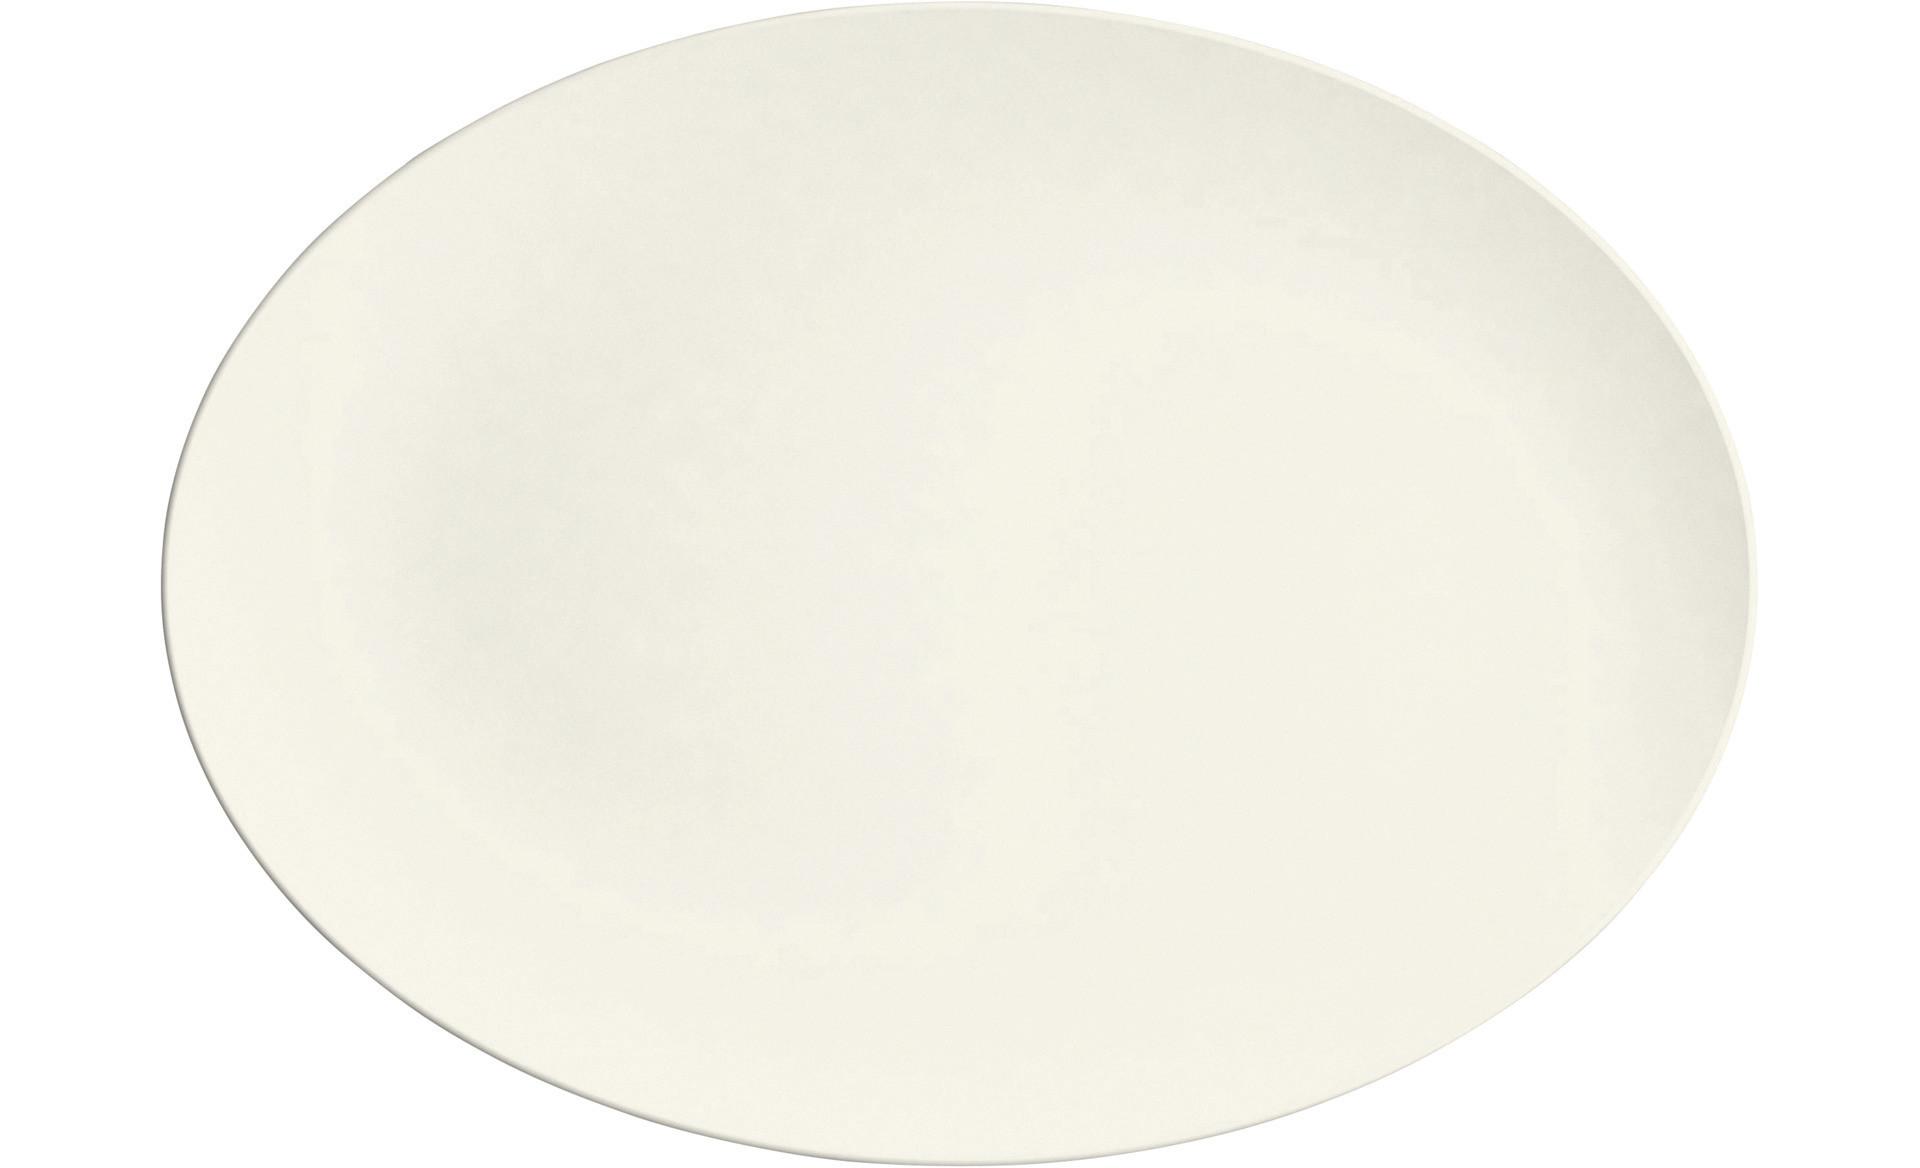 Purity, Coupplatte oval 330 x 240 mm